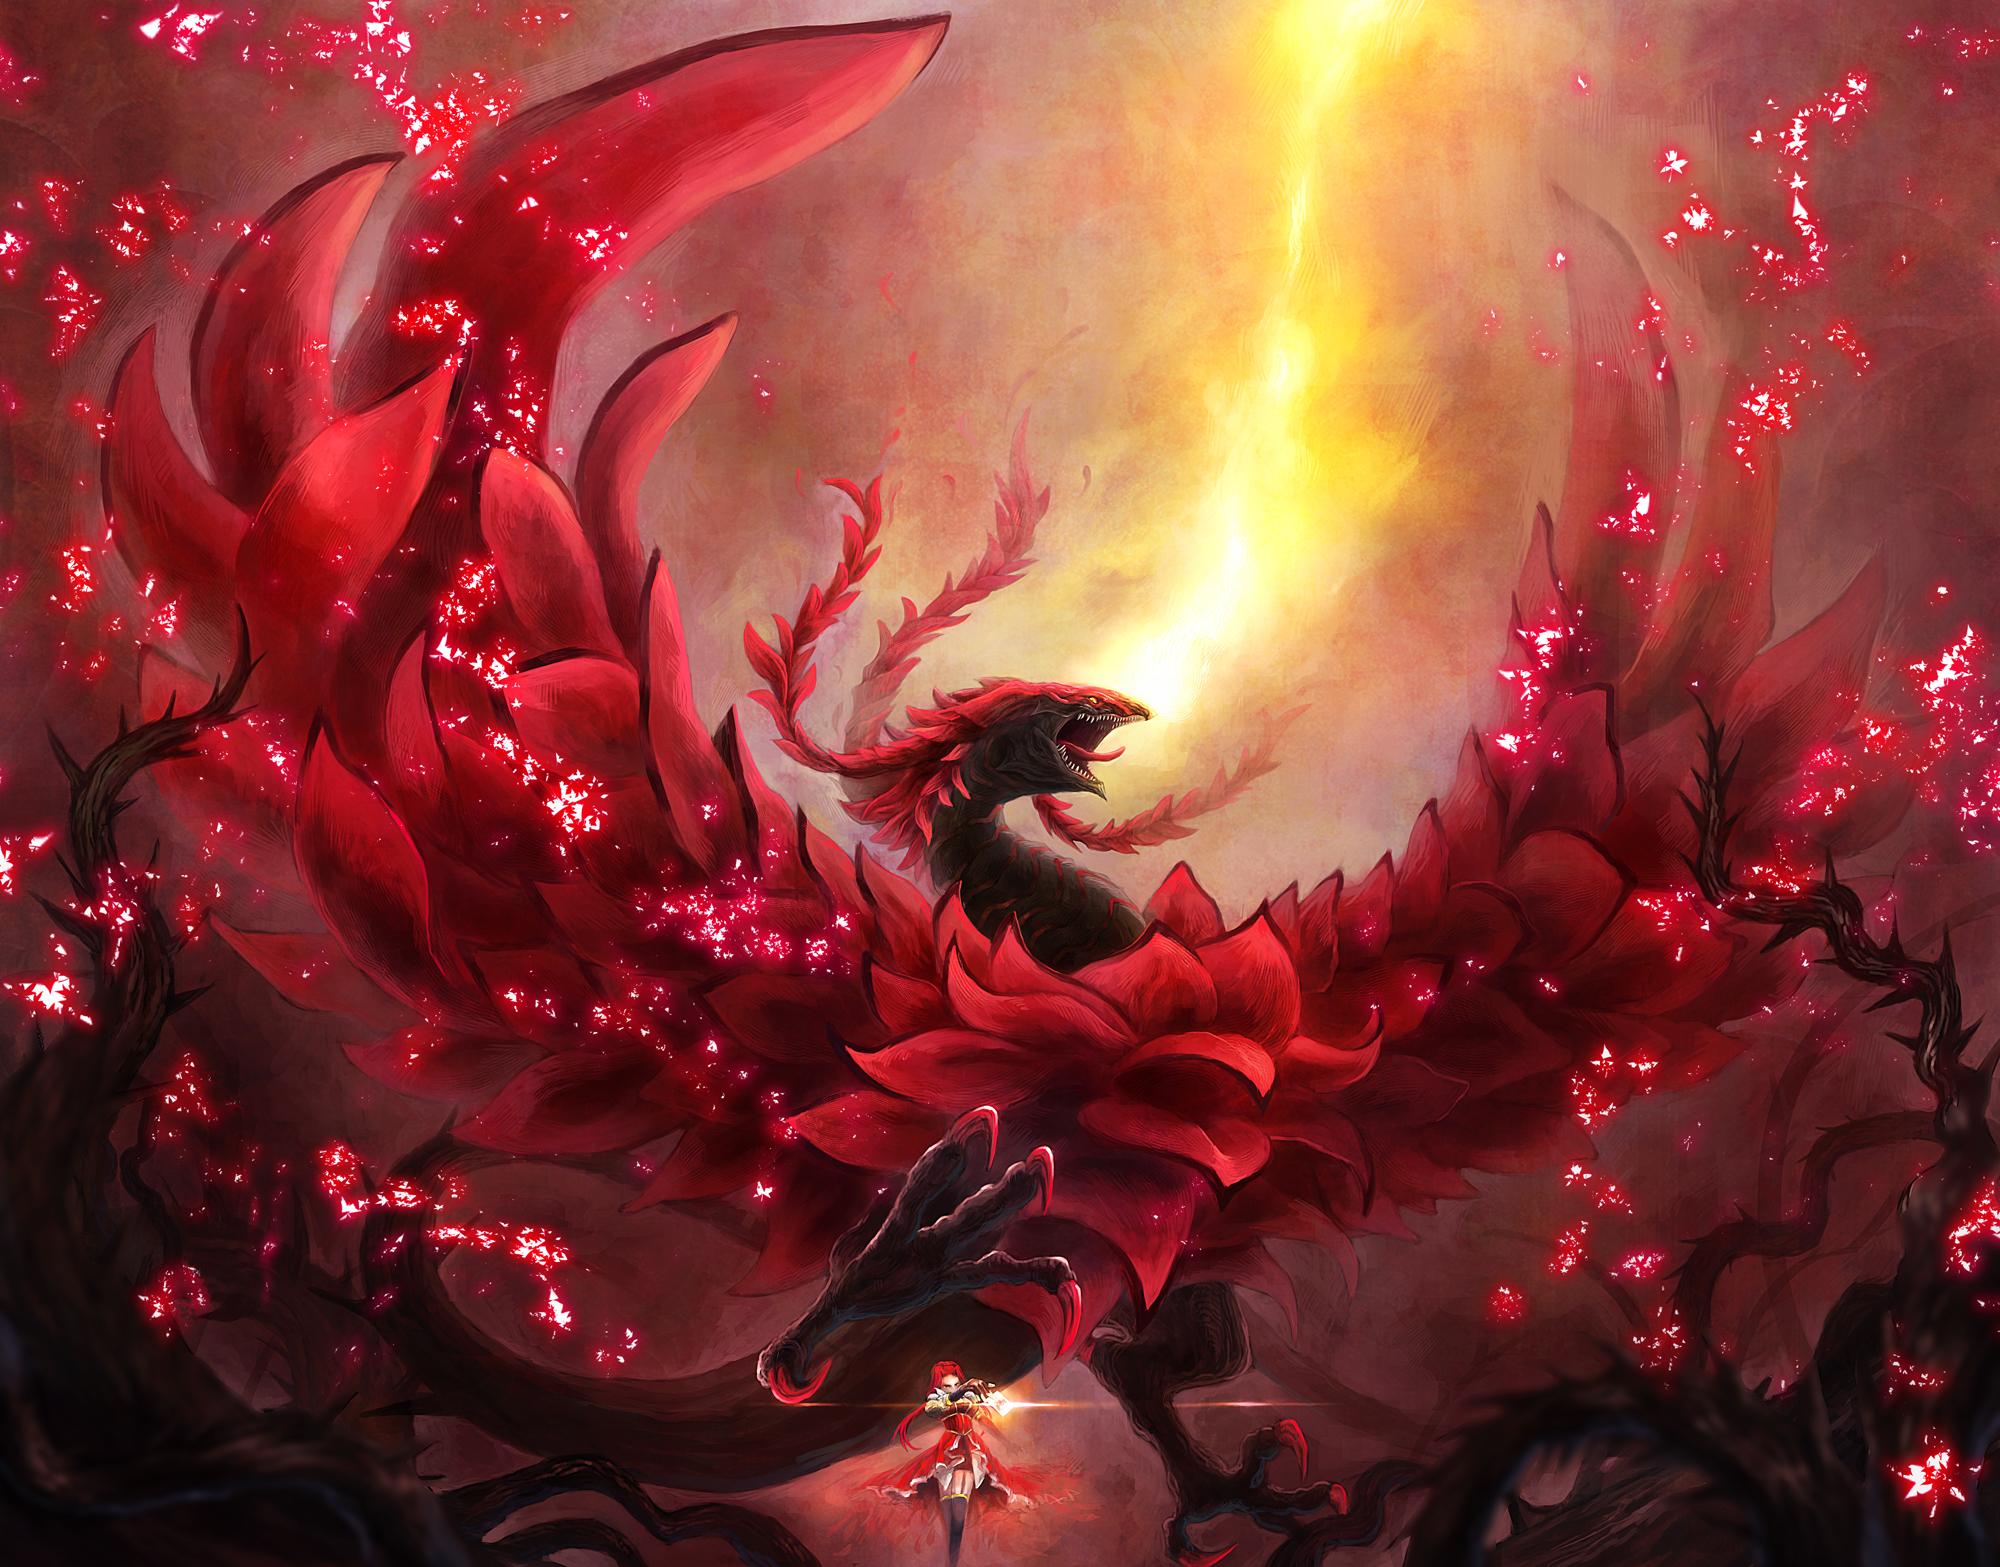 Black rose dragon dragon dress izayoi aki magic red hair for Do black roses really exist